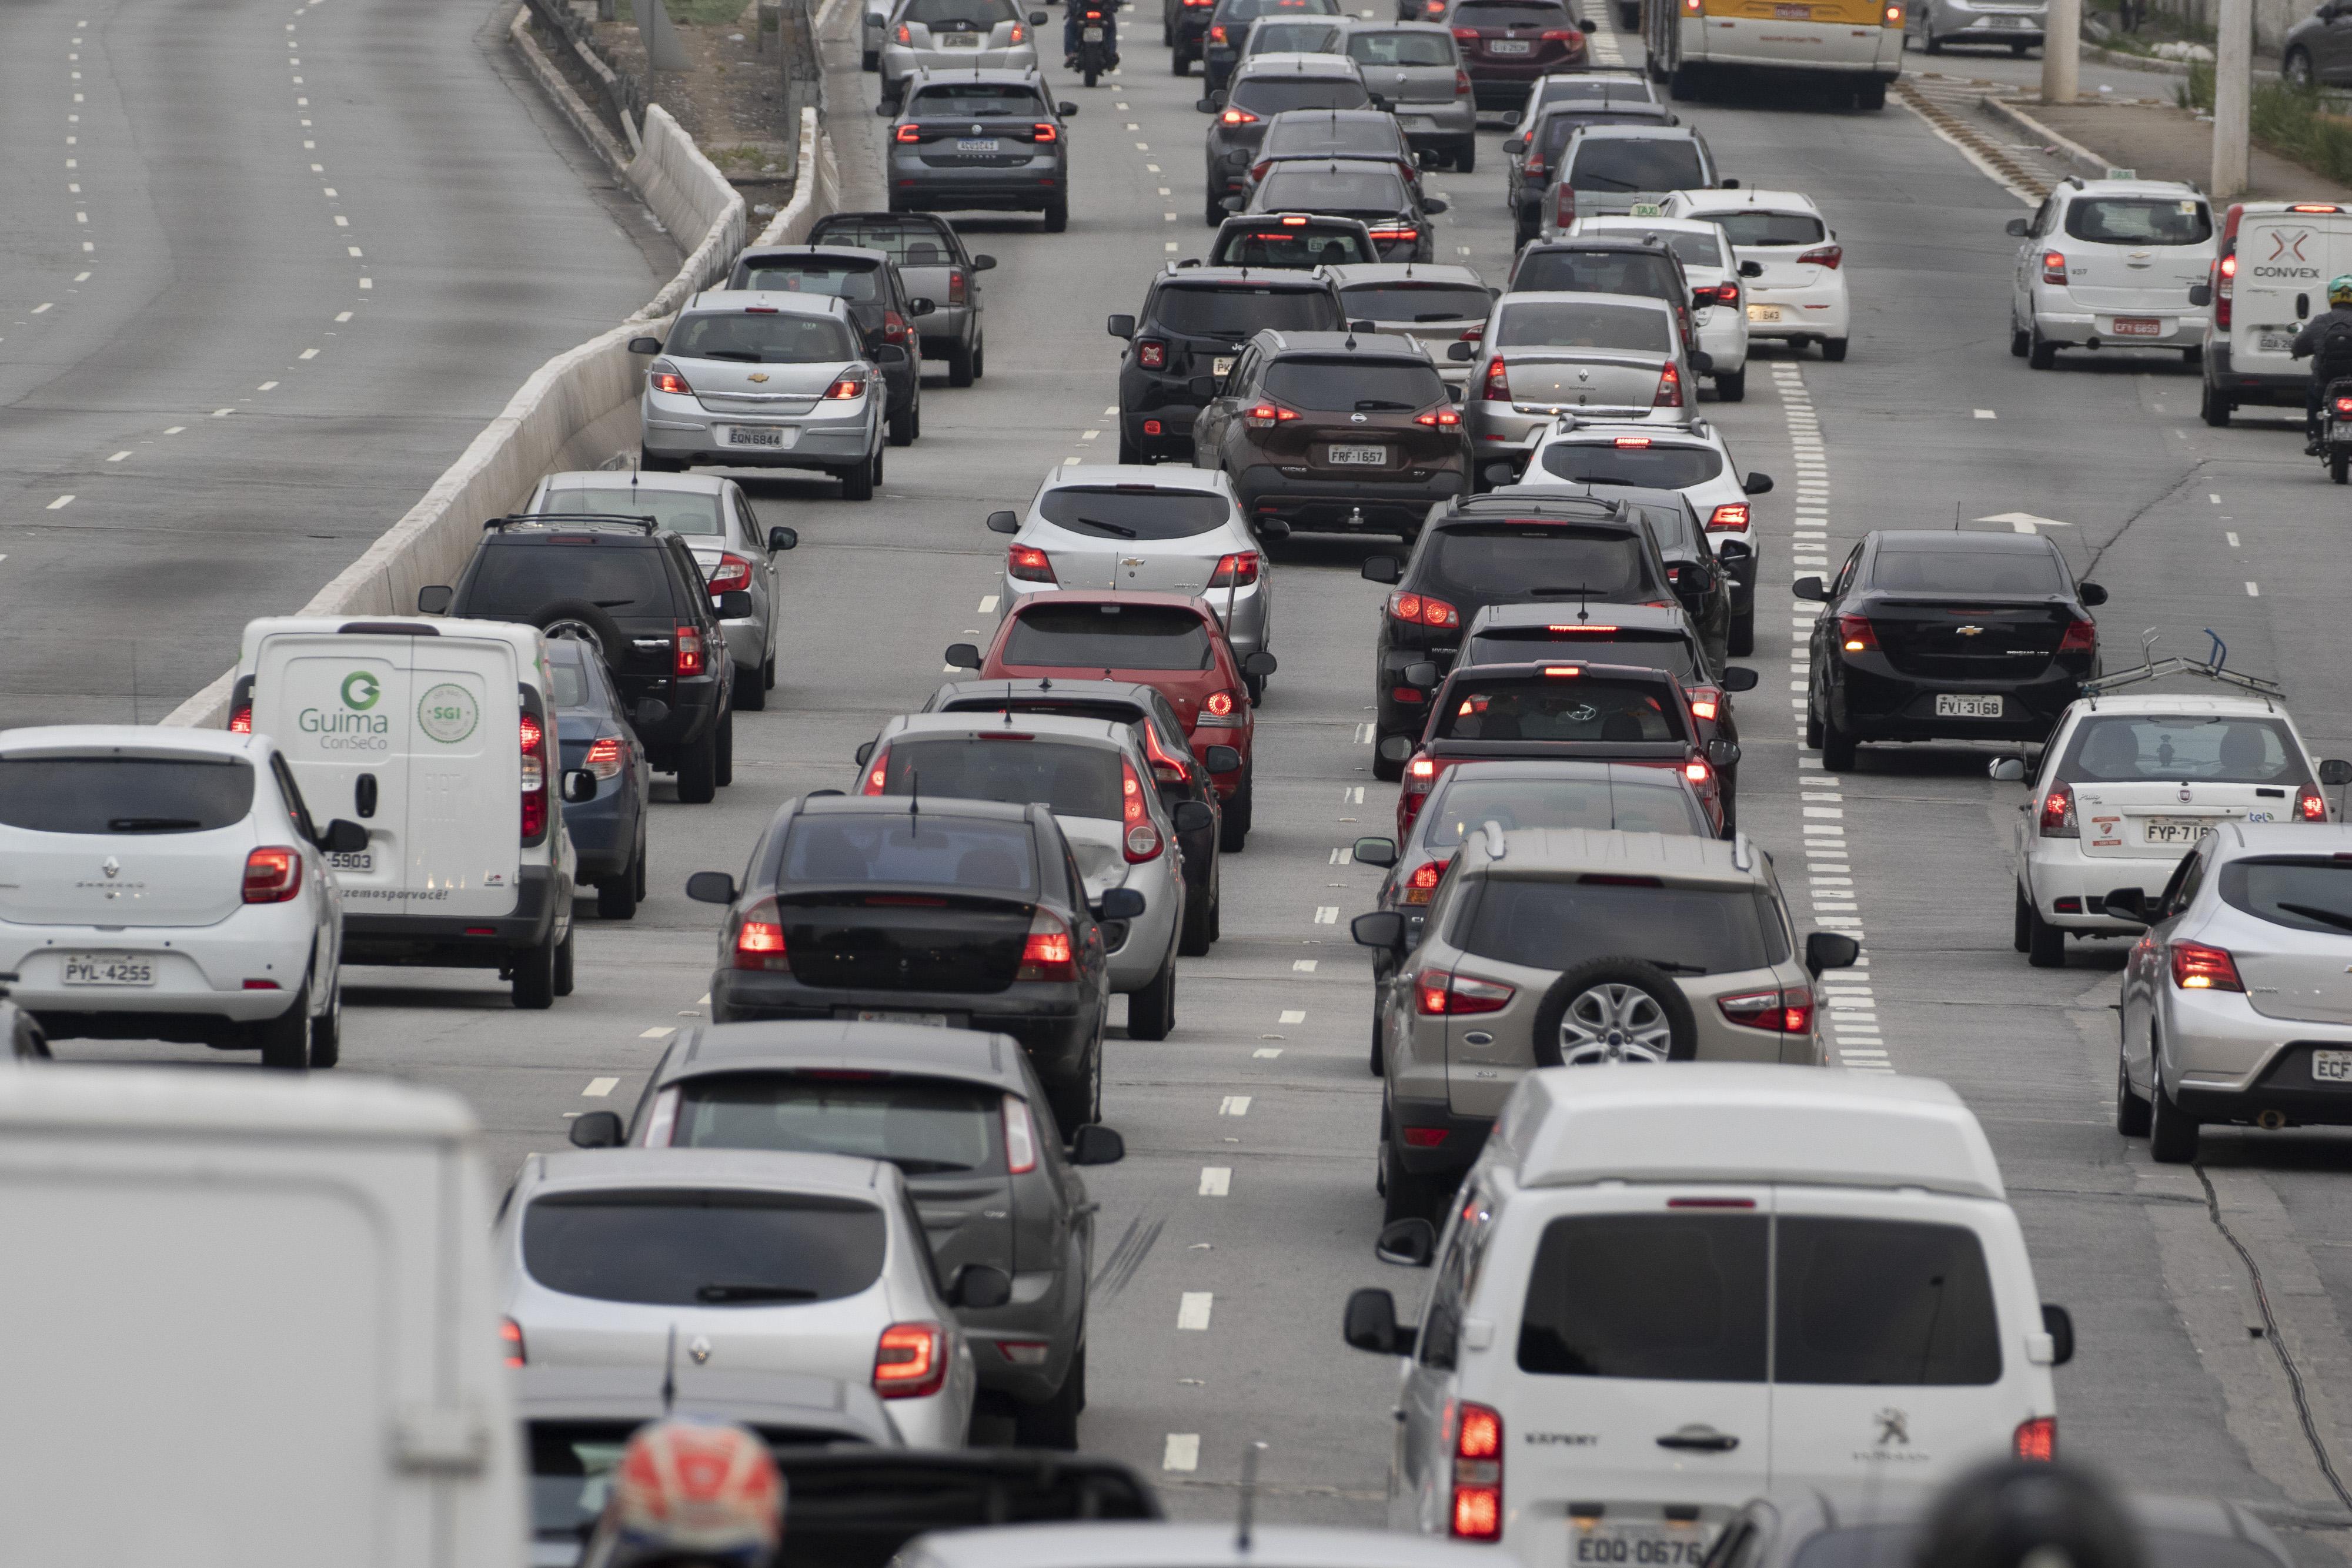 trânsito, São Paulo, coronavírus, lentidão, Waze